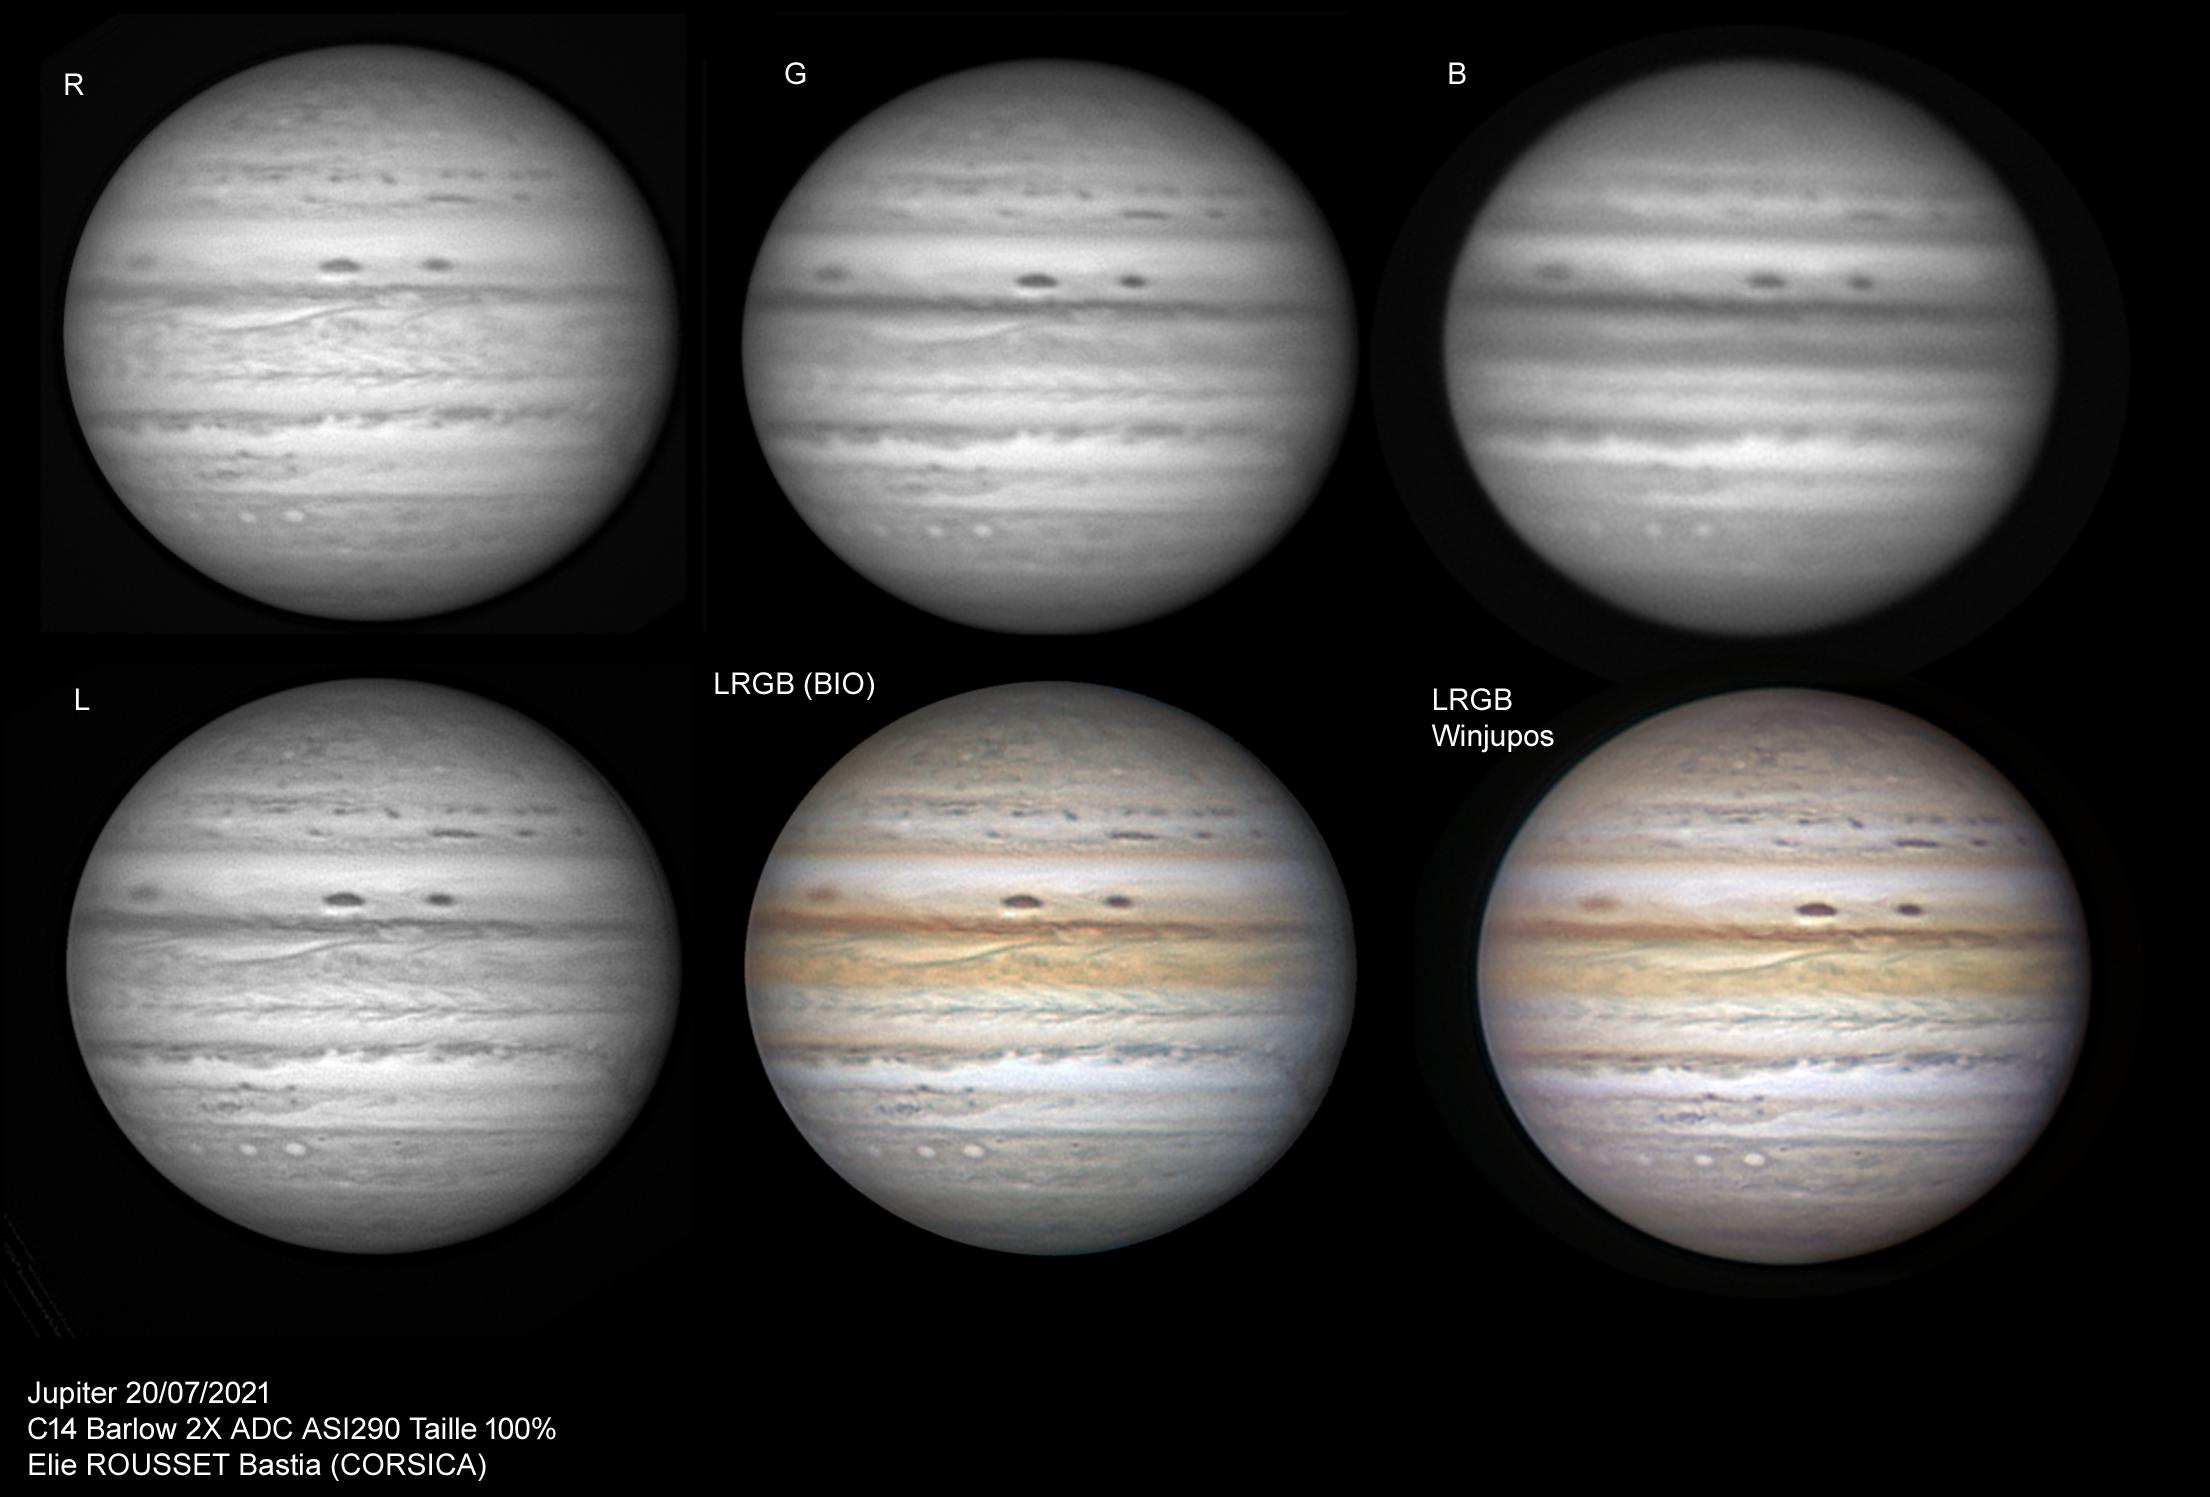 large.Jupiter-20-07-2021-Planche-.jpg.a2762884cba6b31b91aa5ddc449dbb11.jpg